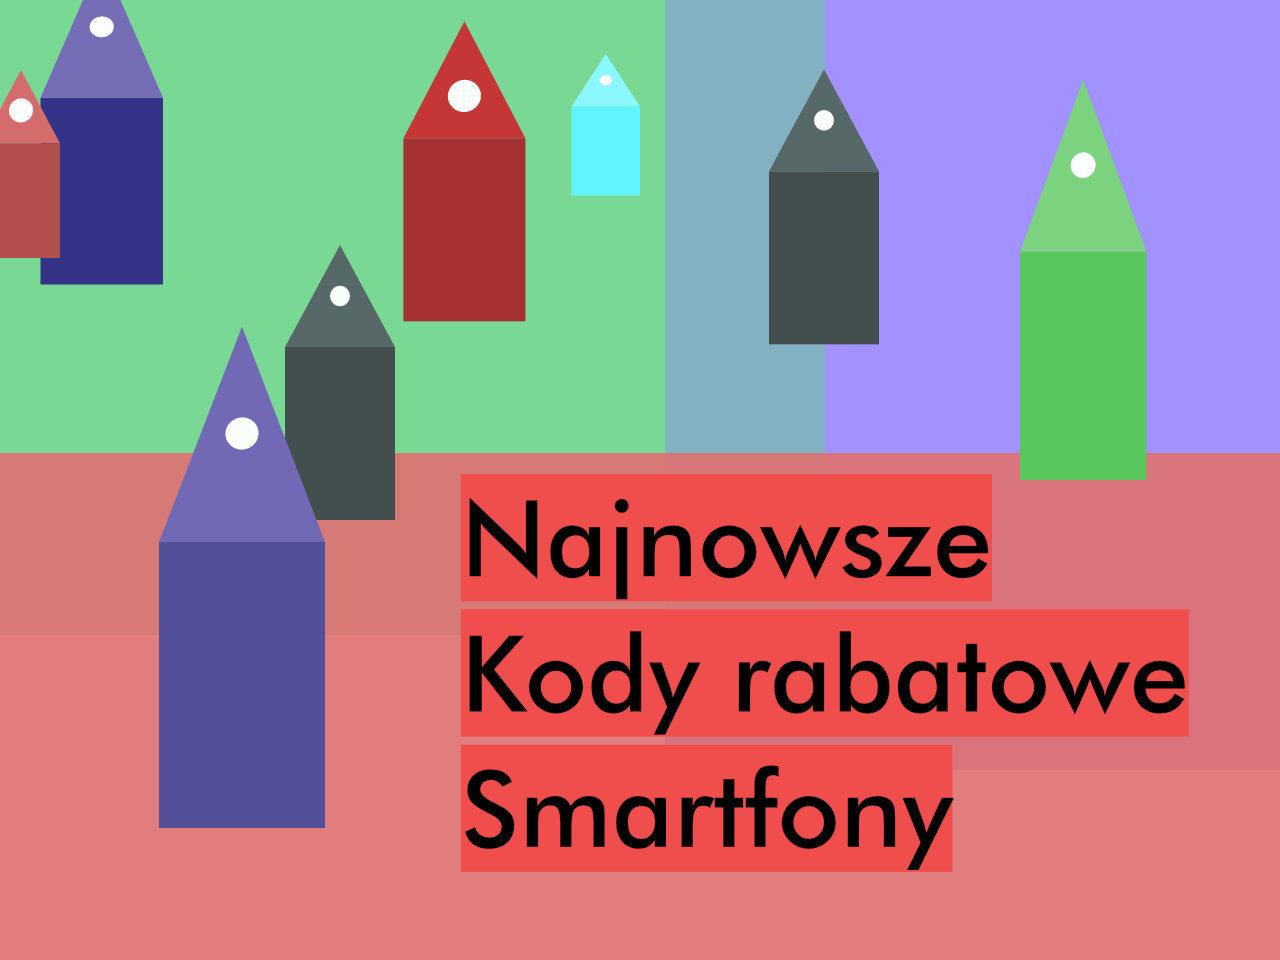 https://www.fandroid.com.pl/wp-content/uploads/Sale-smartfony-kod-rabatowy-promocja-1280x960.jpg